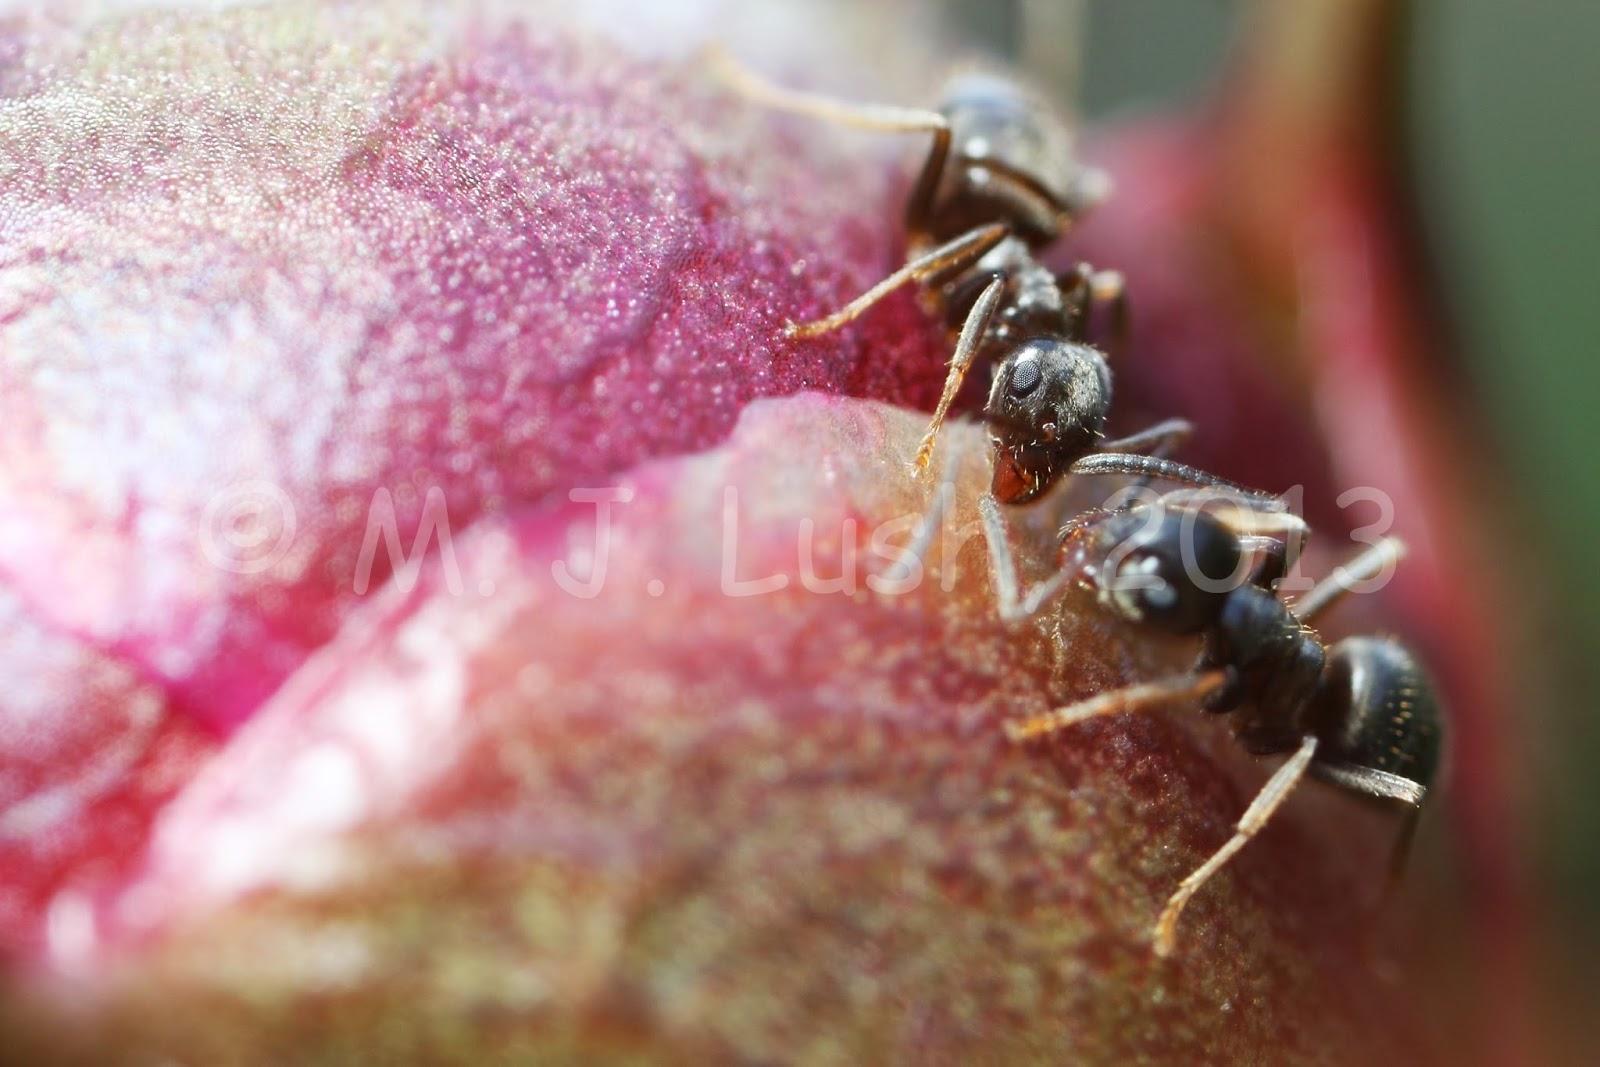 Lasius niger on garden peony